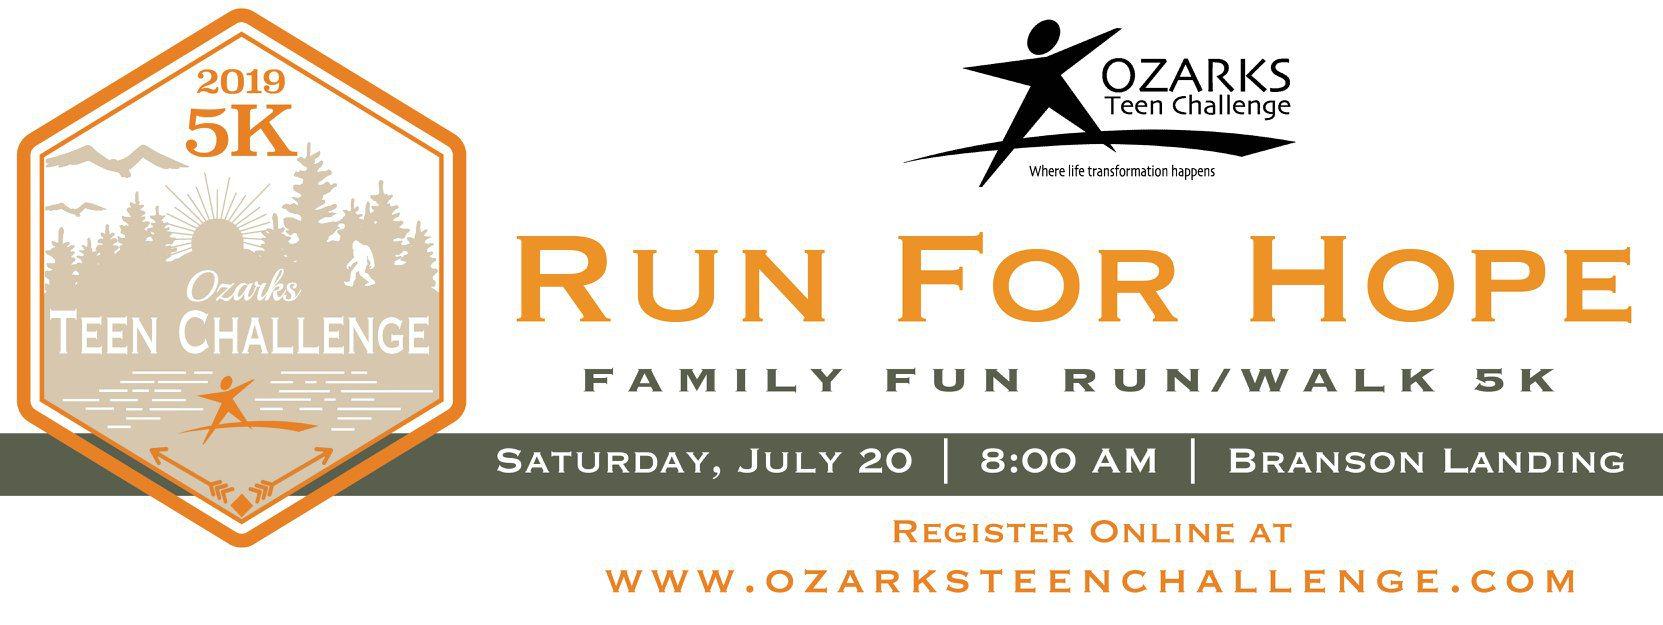 OZARKS TEEN CHALLENGE FAMILY 5K RUN/WALK